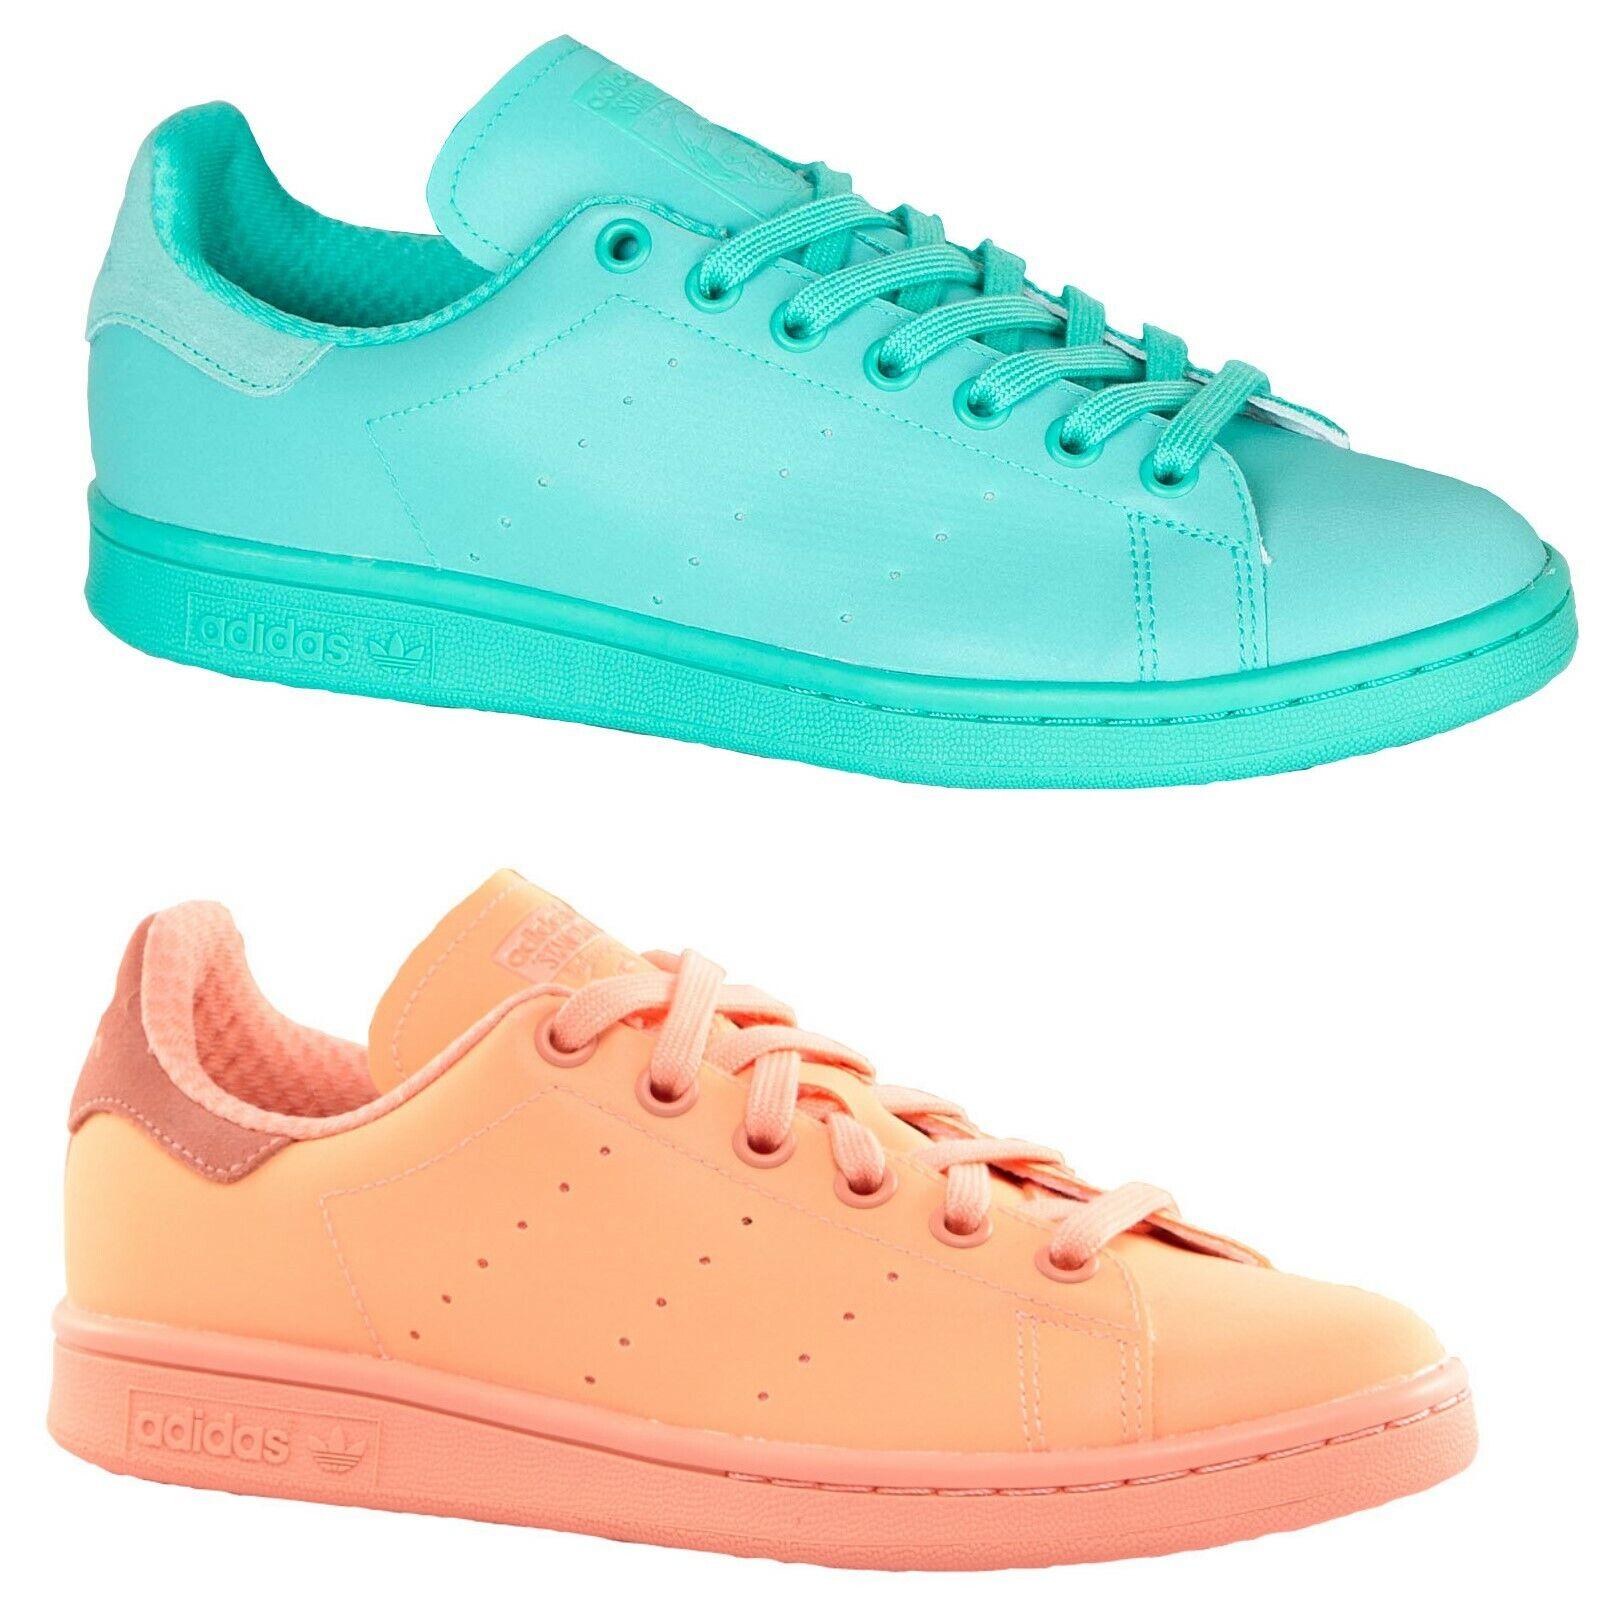 adidas Stan Smith Originals Schuhe Herren Damen damen Unisex Turnschuhe grün